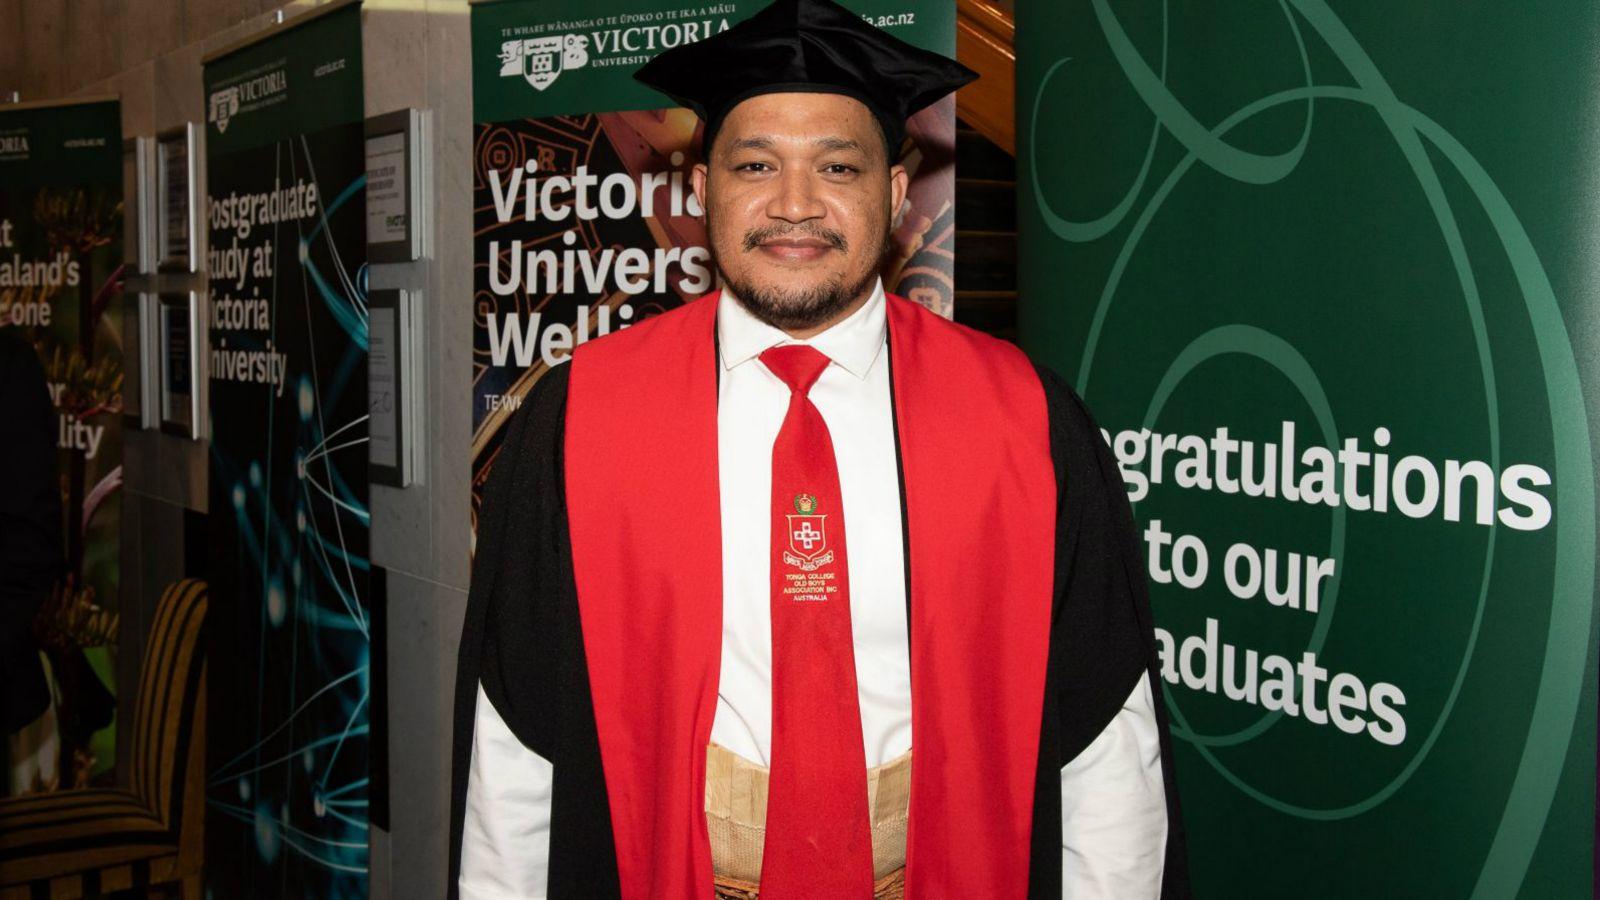 PhD graduate Taitusi Taufa, in graduation attire, stands in front of Victoria University of Wellington graduation banners